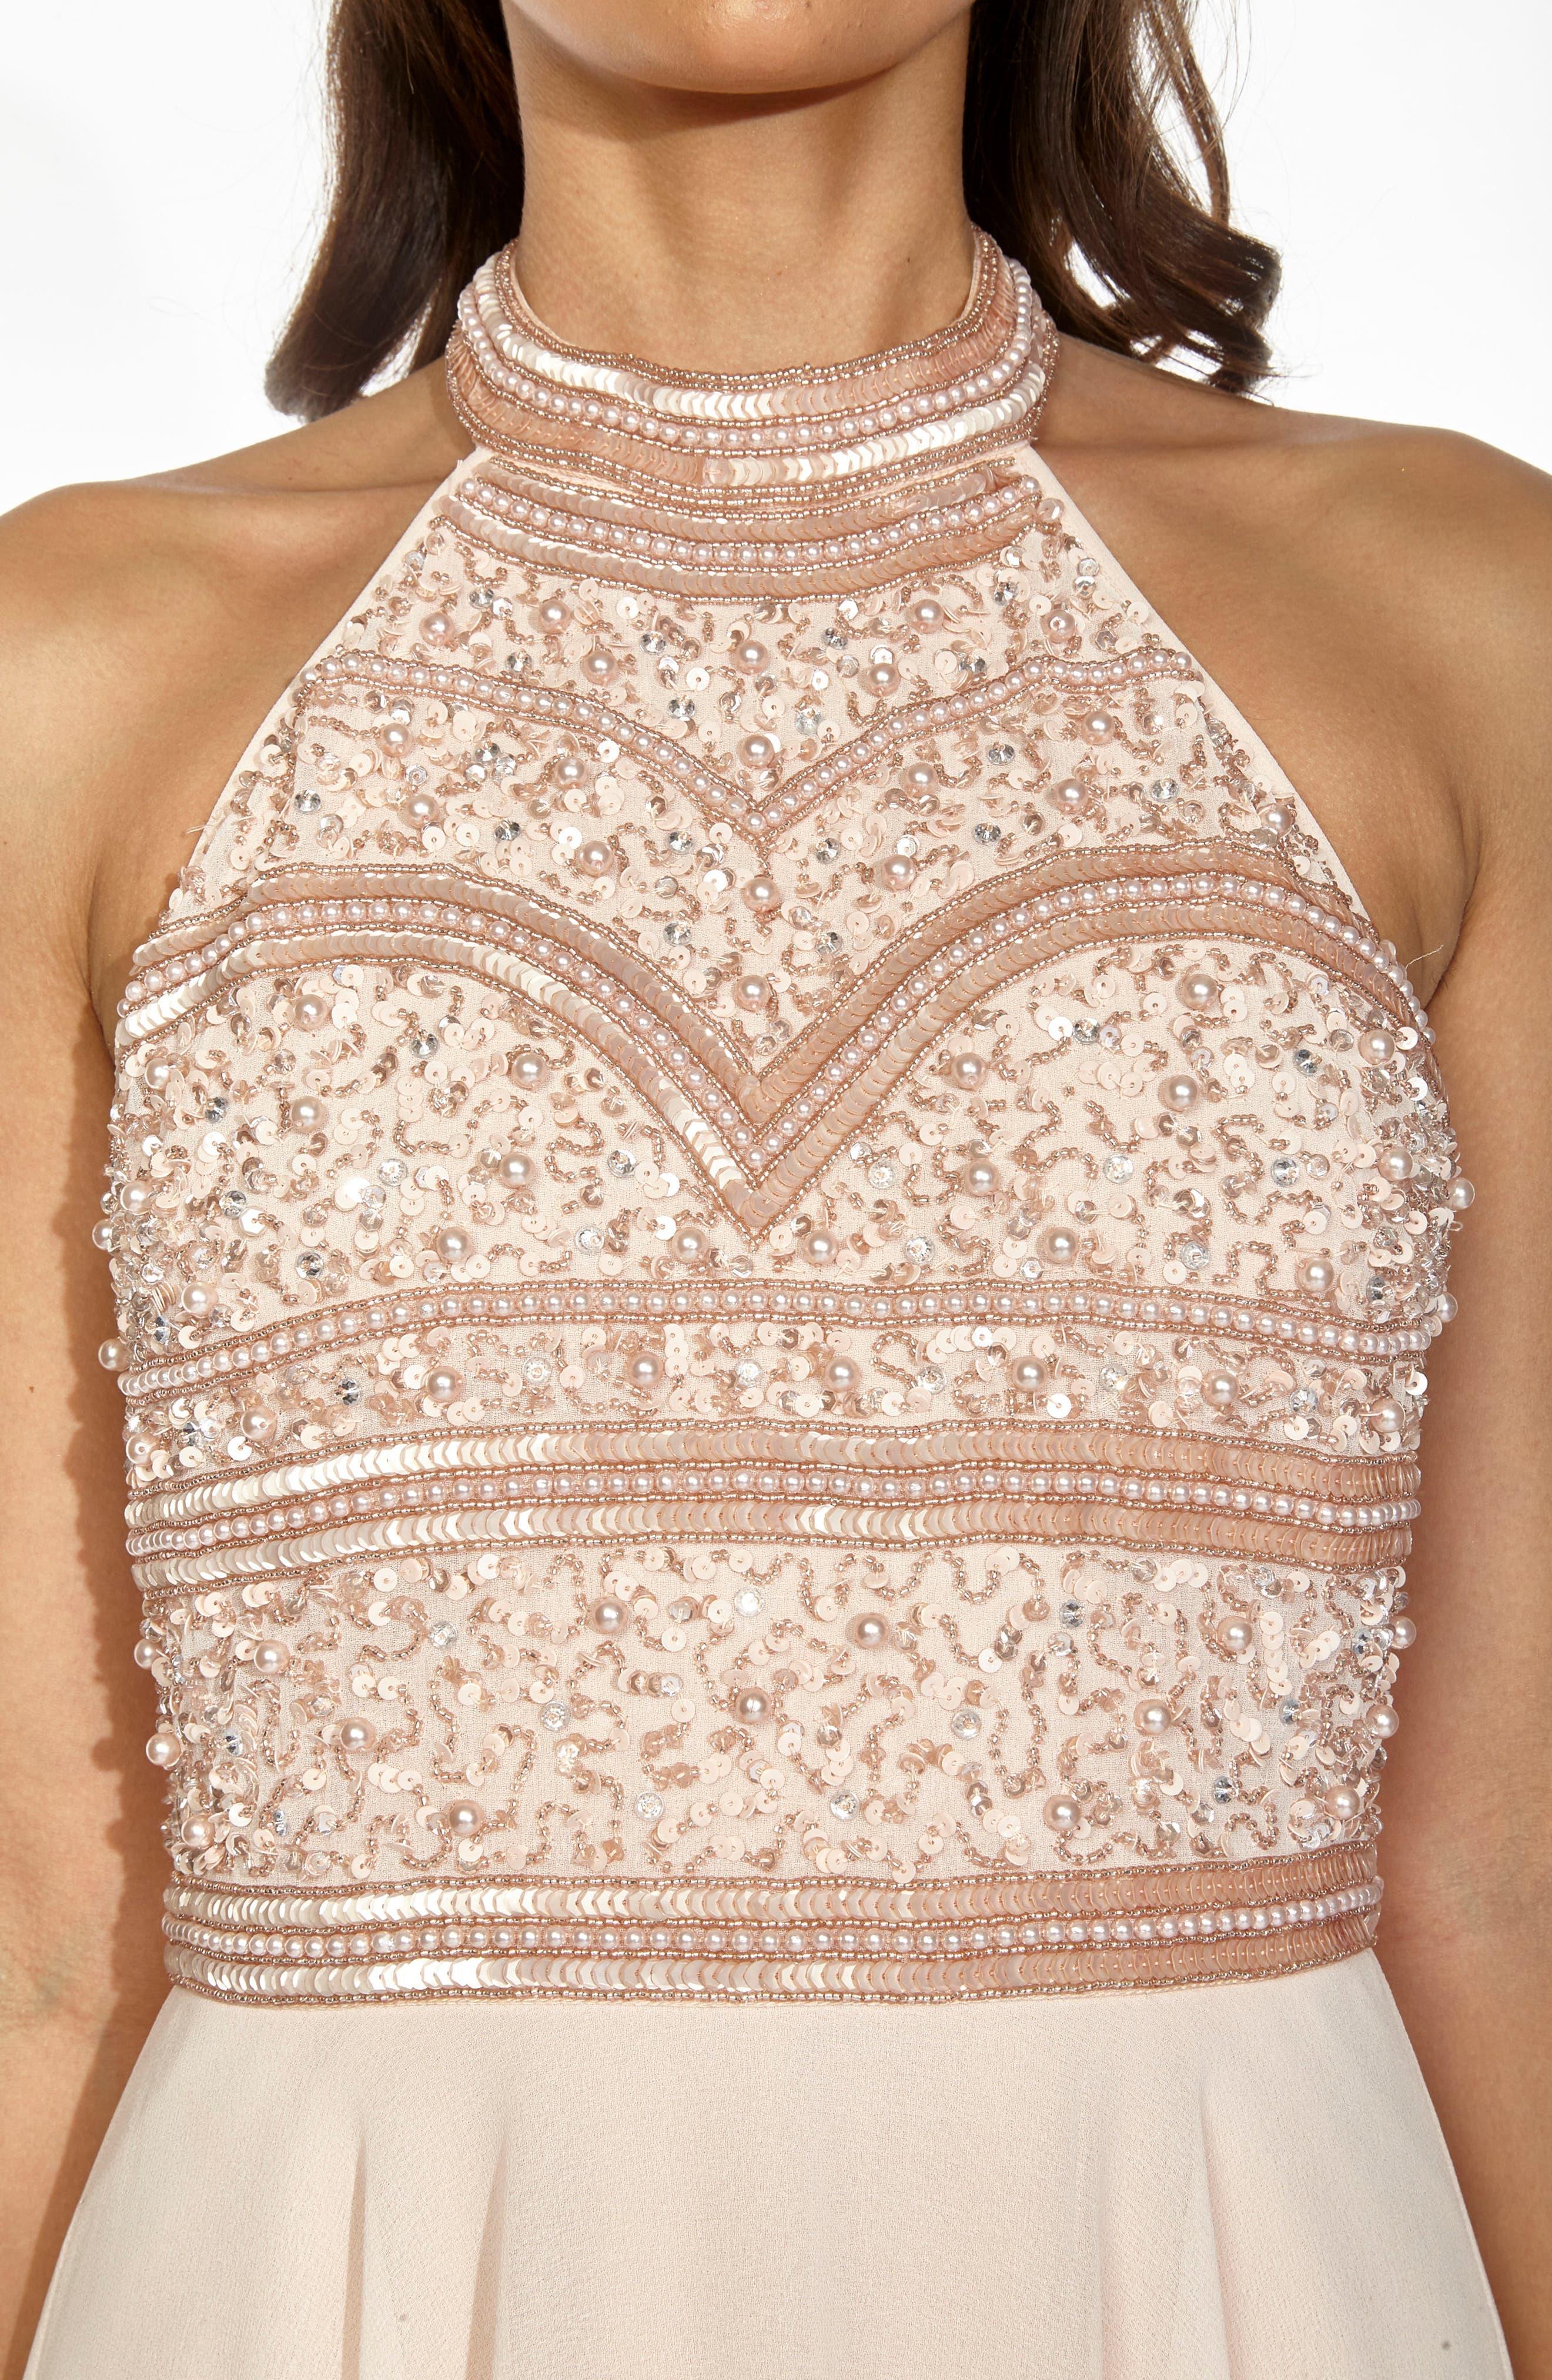 Sunrise Embellished Halter Maxi Dress,                             Alternate thumbnail 4, color,                             250